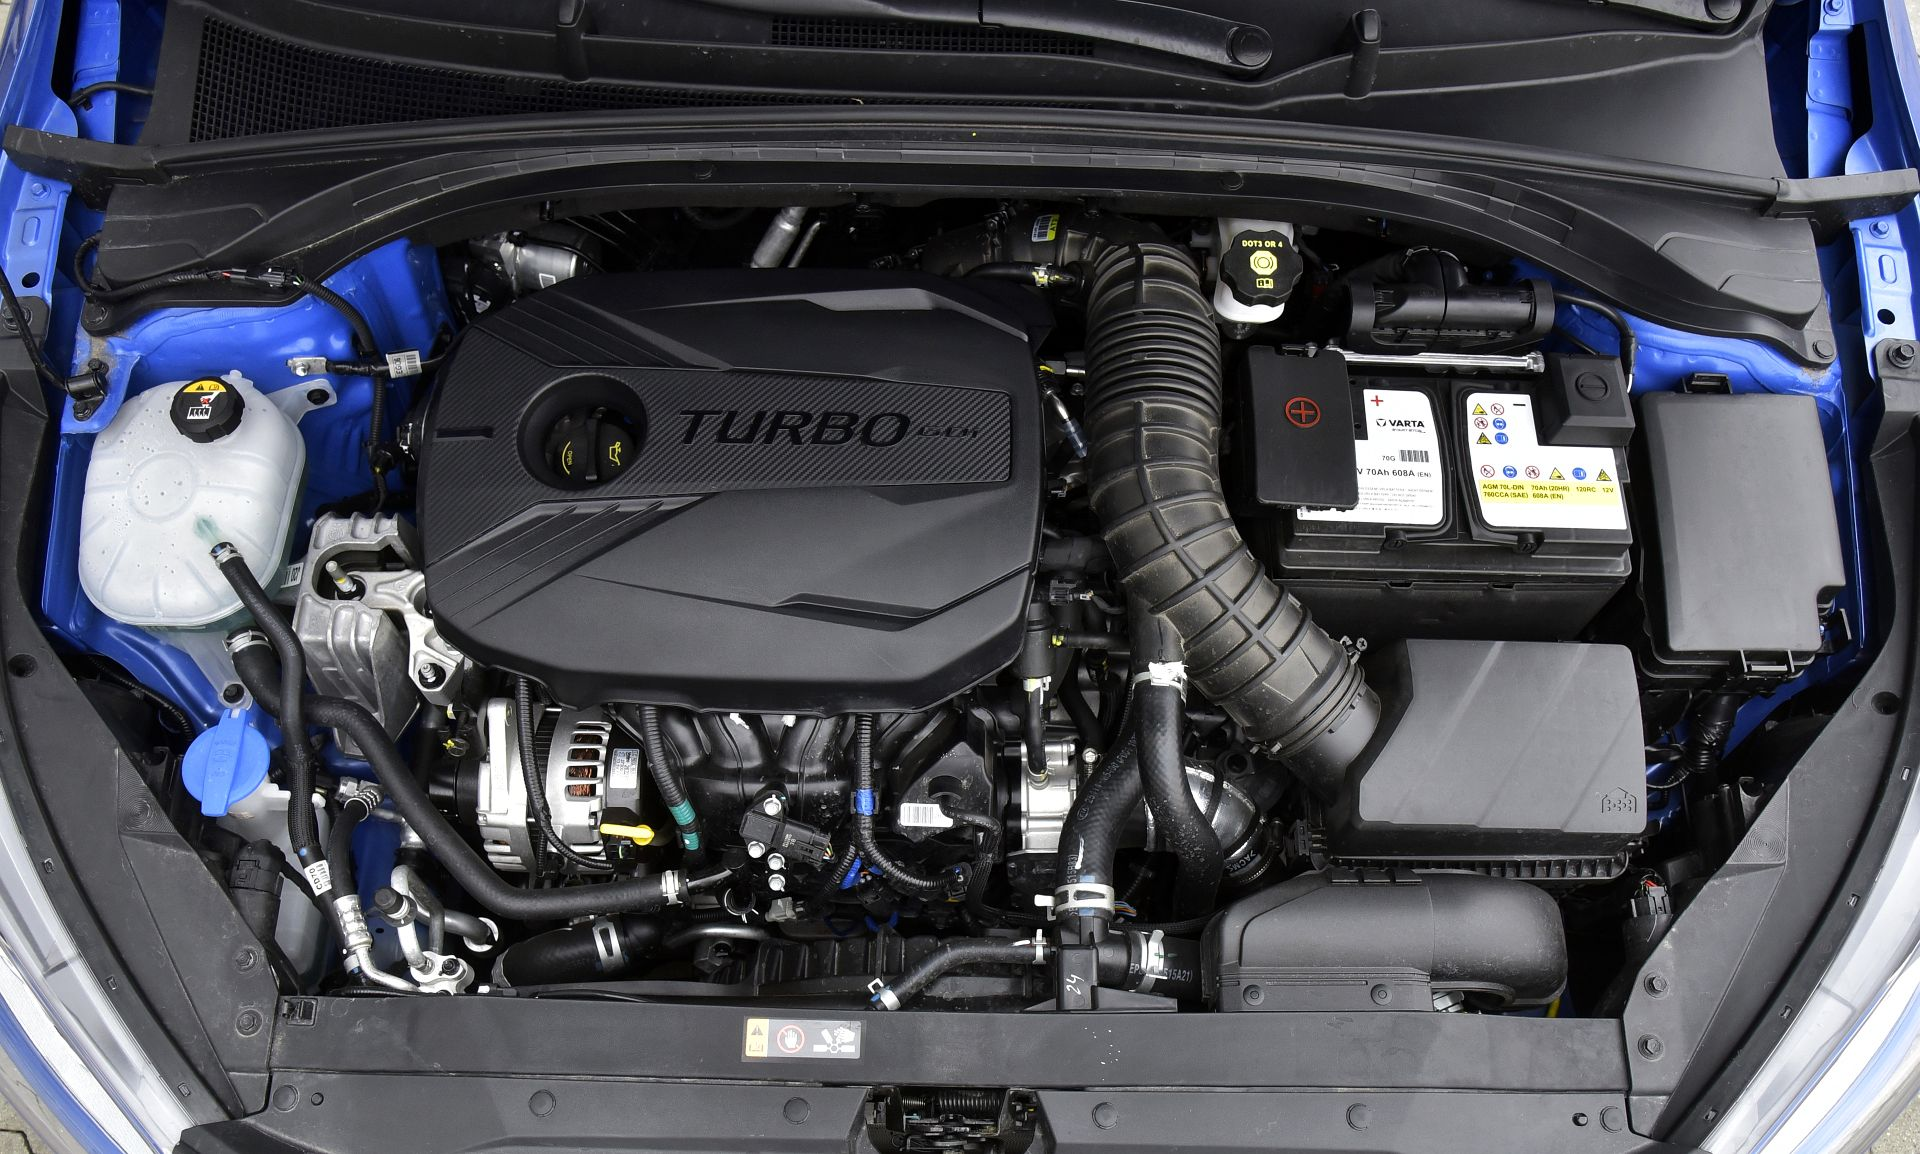 KIA ProCeed III GT 1.6Turbo-GDi 204KM 7AT DCT WN3521L 03-2019